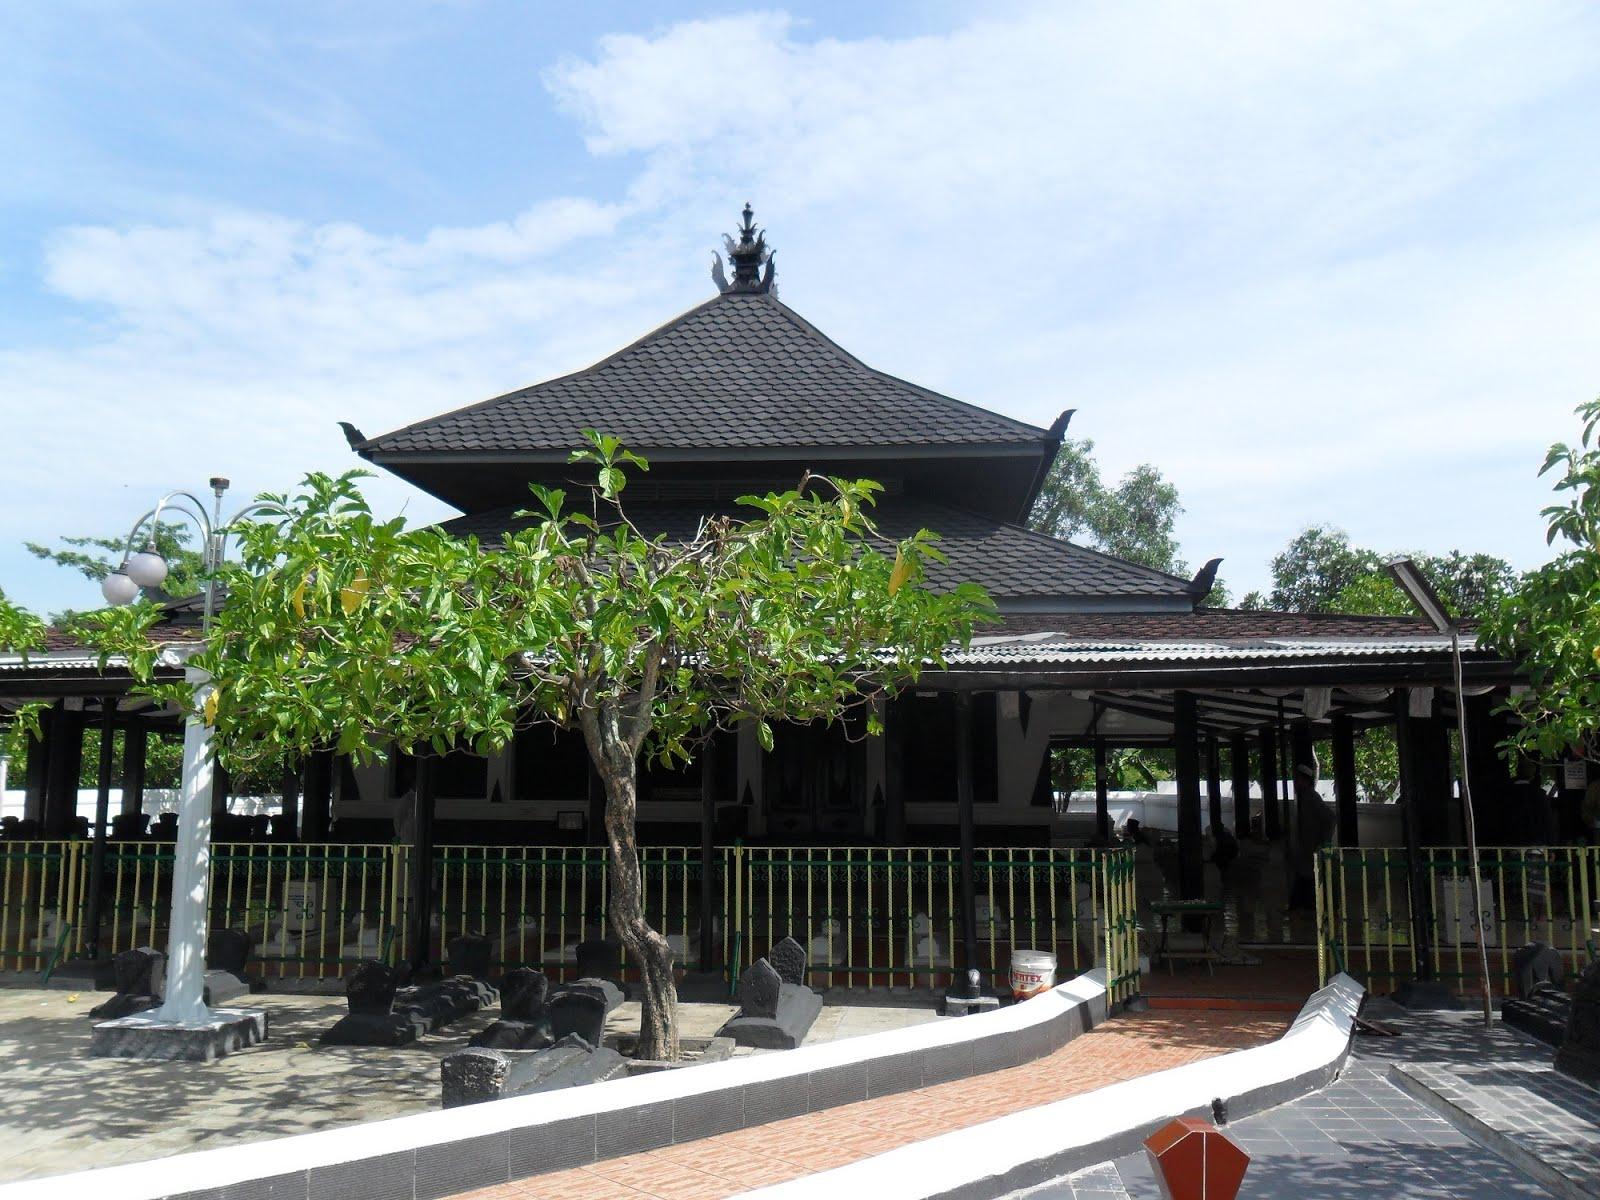 alamat makam sunan kalijaga dan sejarah singkatnya wajib baca rh wajibbaca com